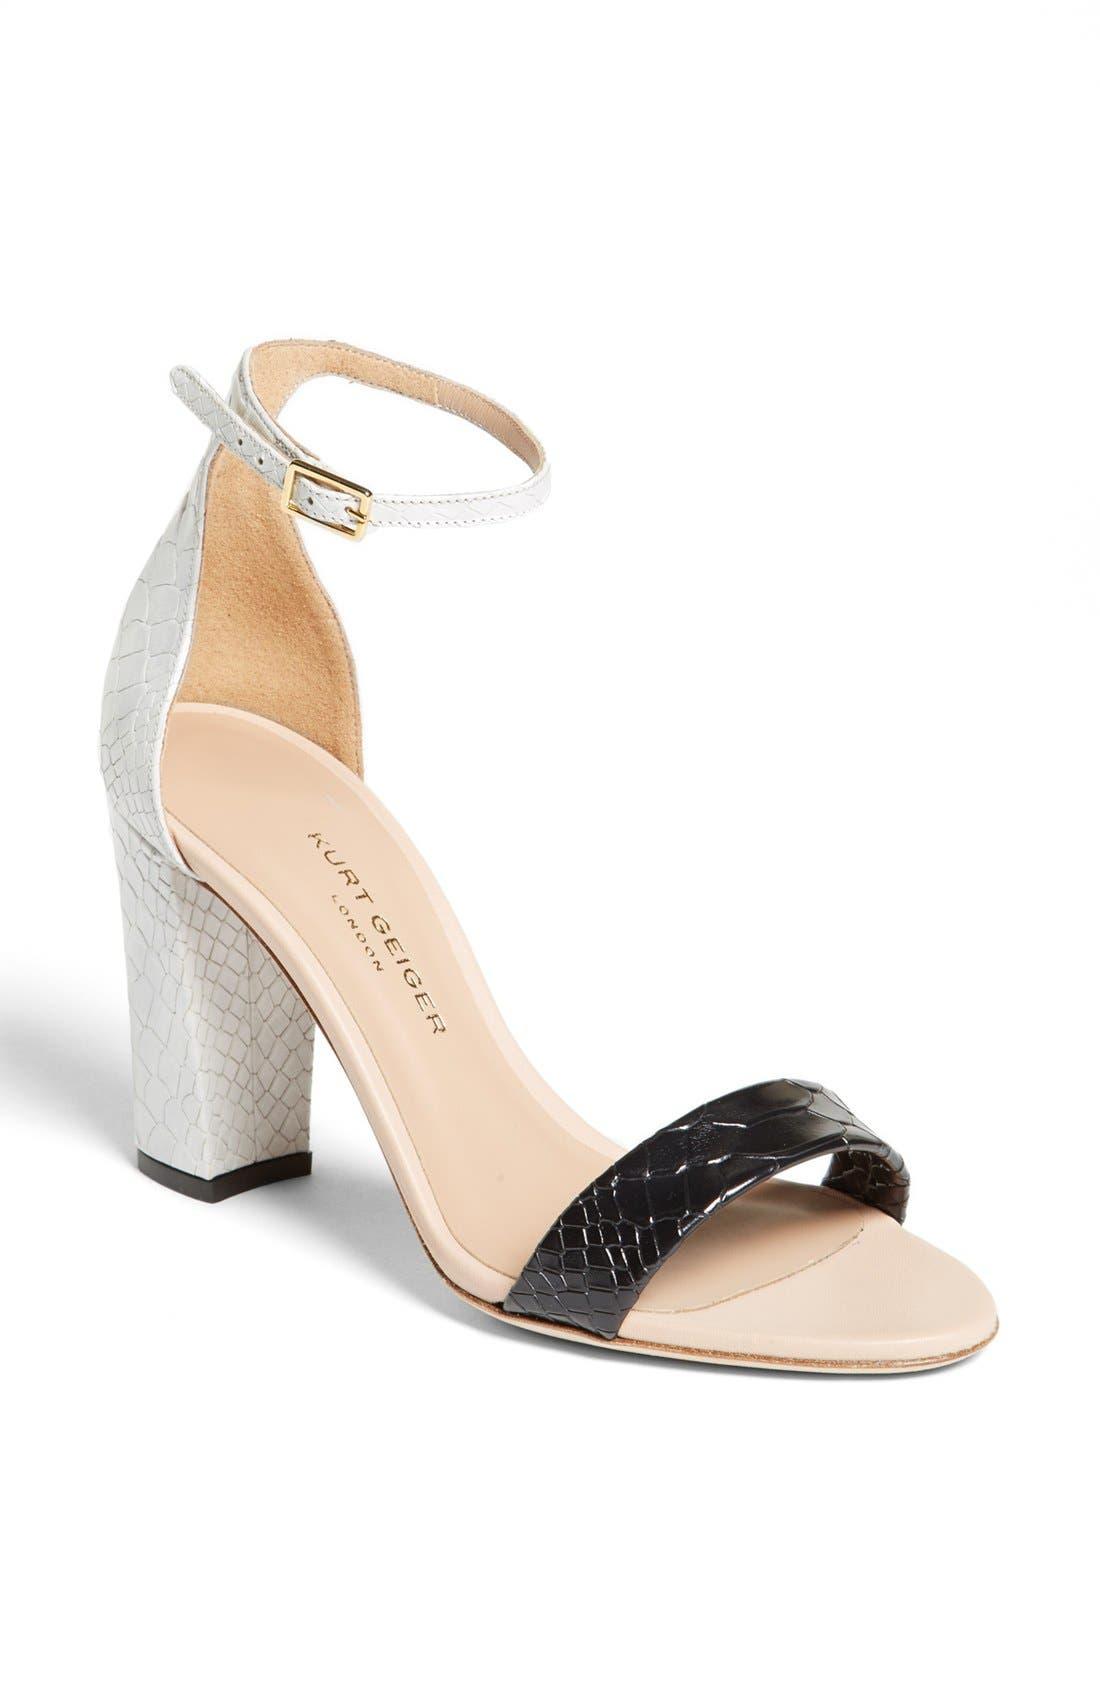 Alternate Image 1 Selected - Kurt Geiger London 'Isabella' Sandal